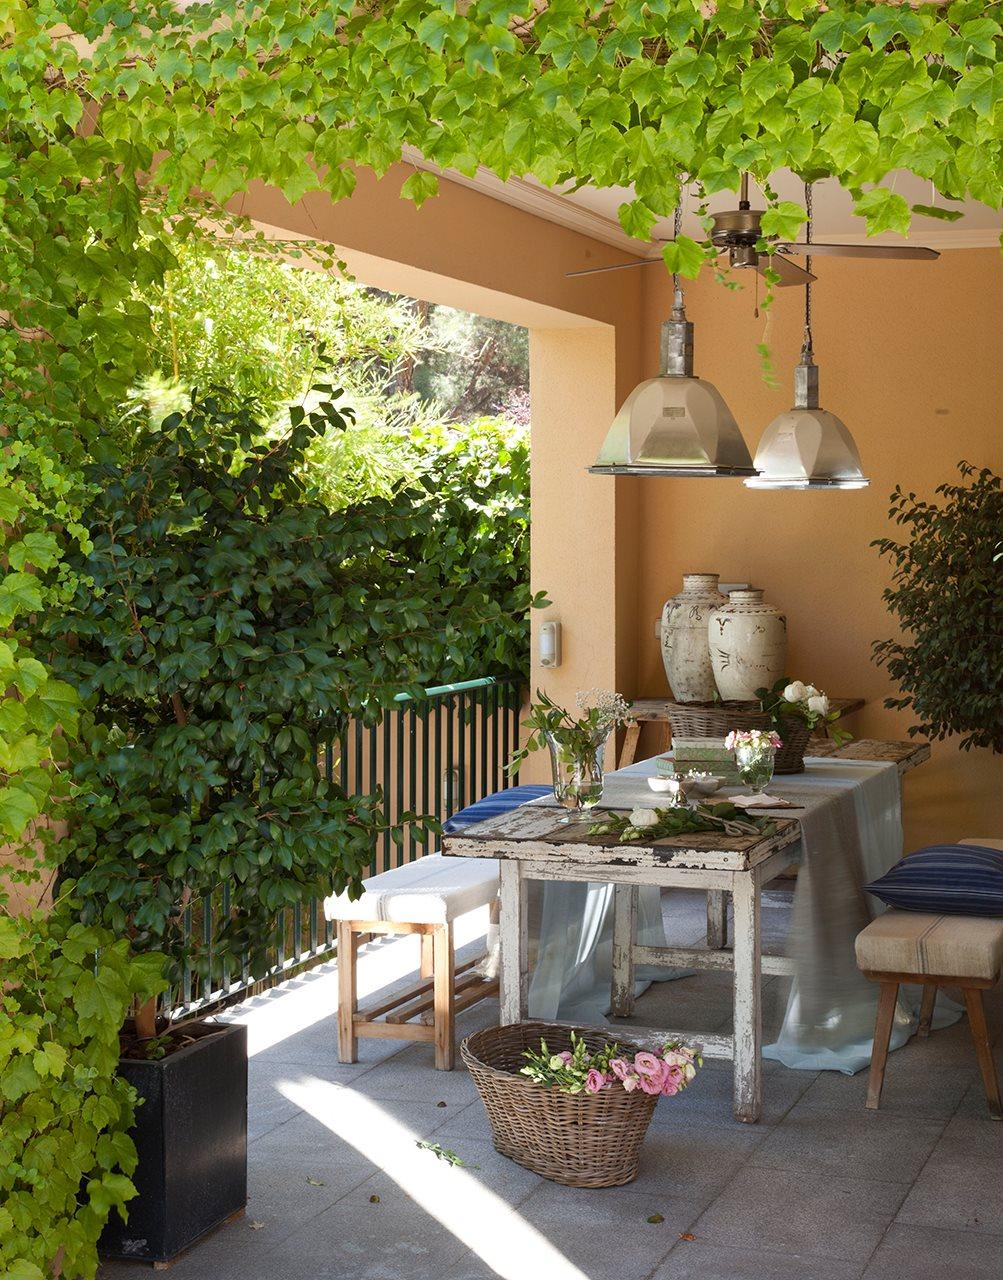 Los 15 mejores comedores de exterior for Comedor para terraza